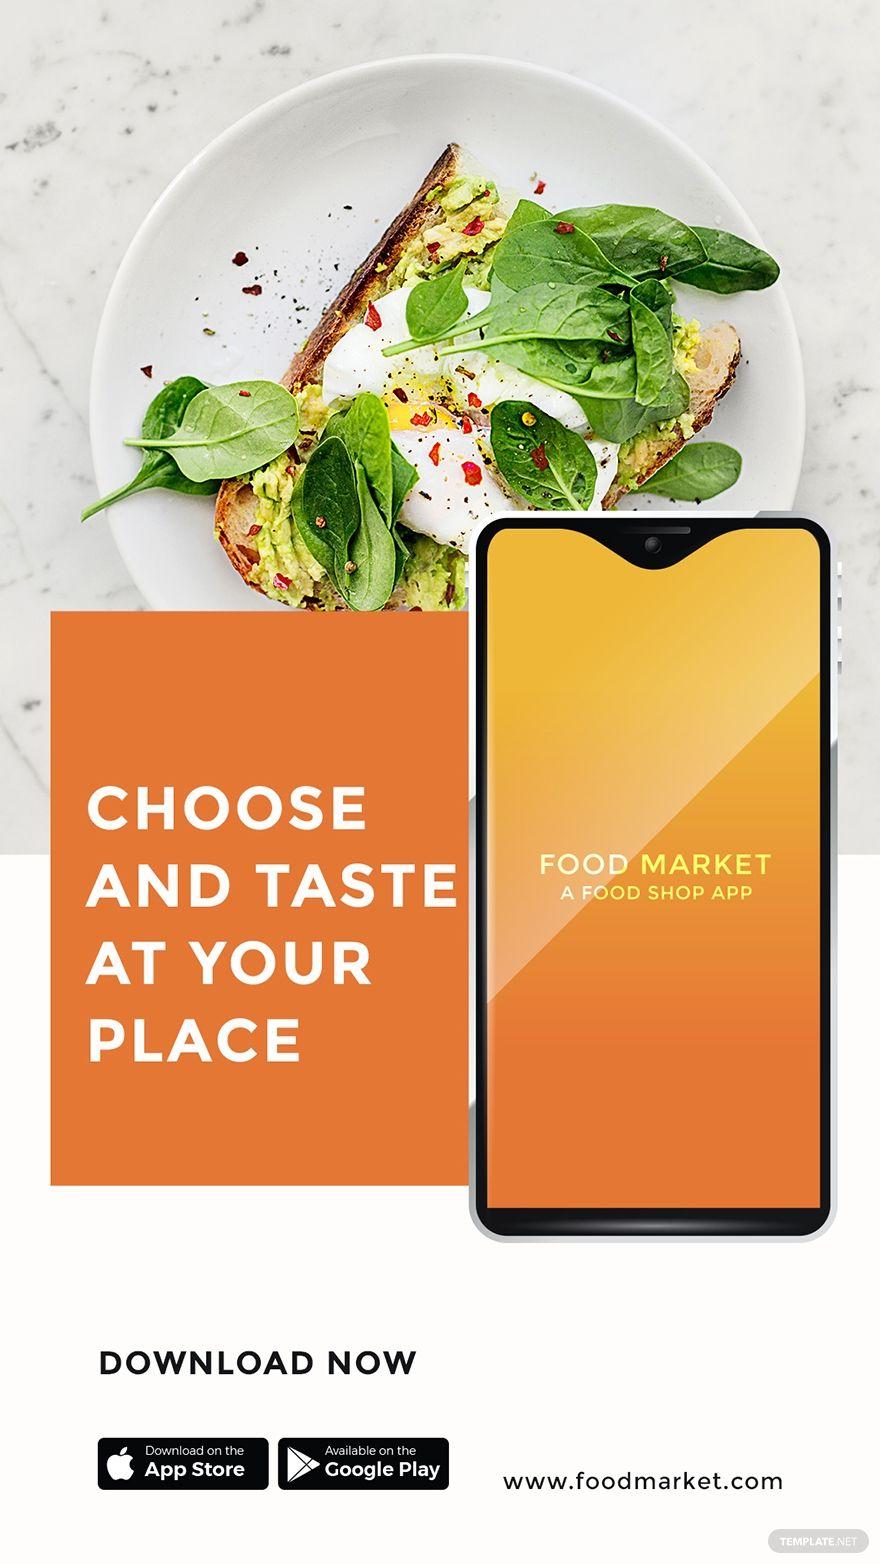 Free Food Mobile App Promotion Instagram Story In 2020 App